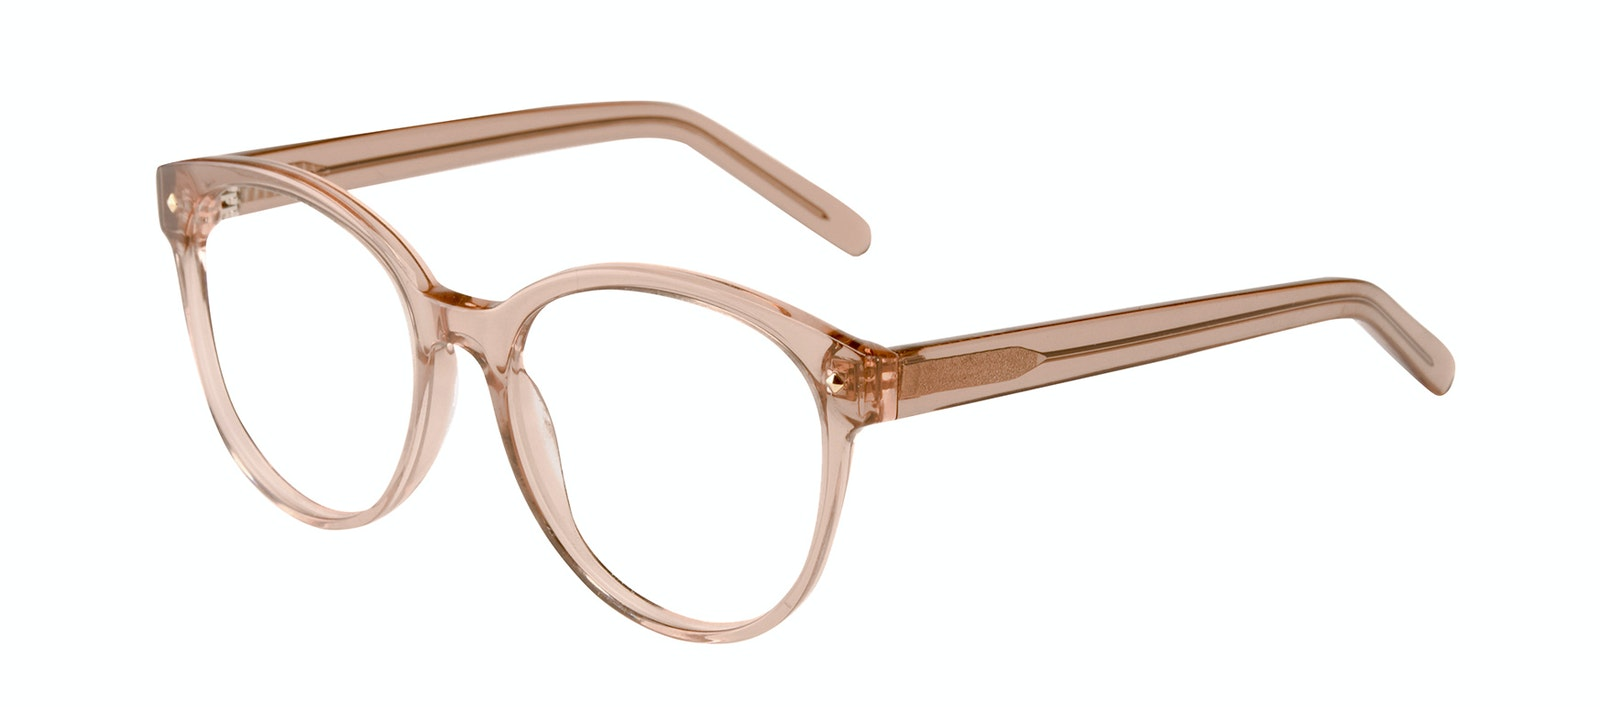 Affordable Fashion Glasses Round Eyeglasses Women Eclipse Toffee Tilt